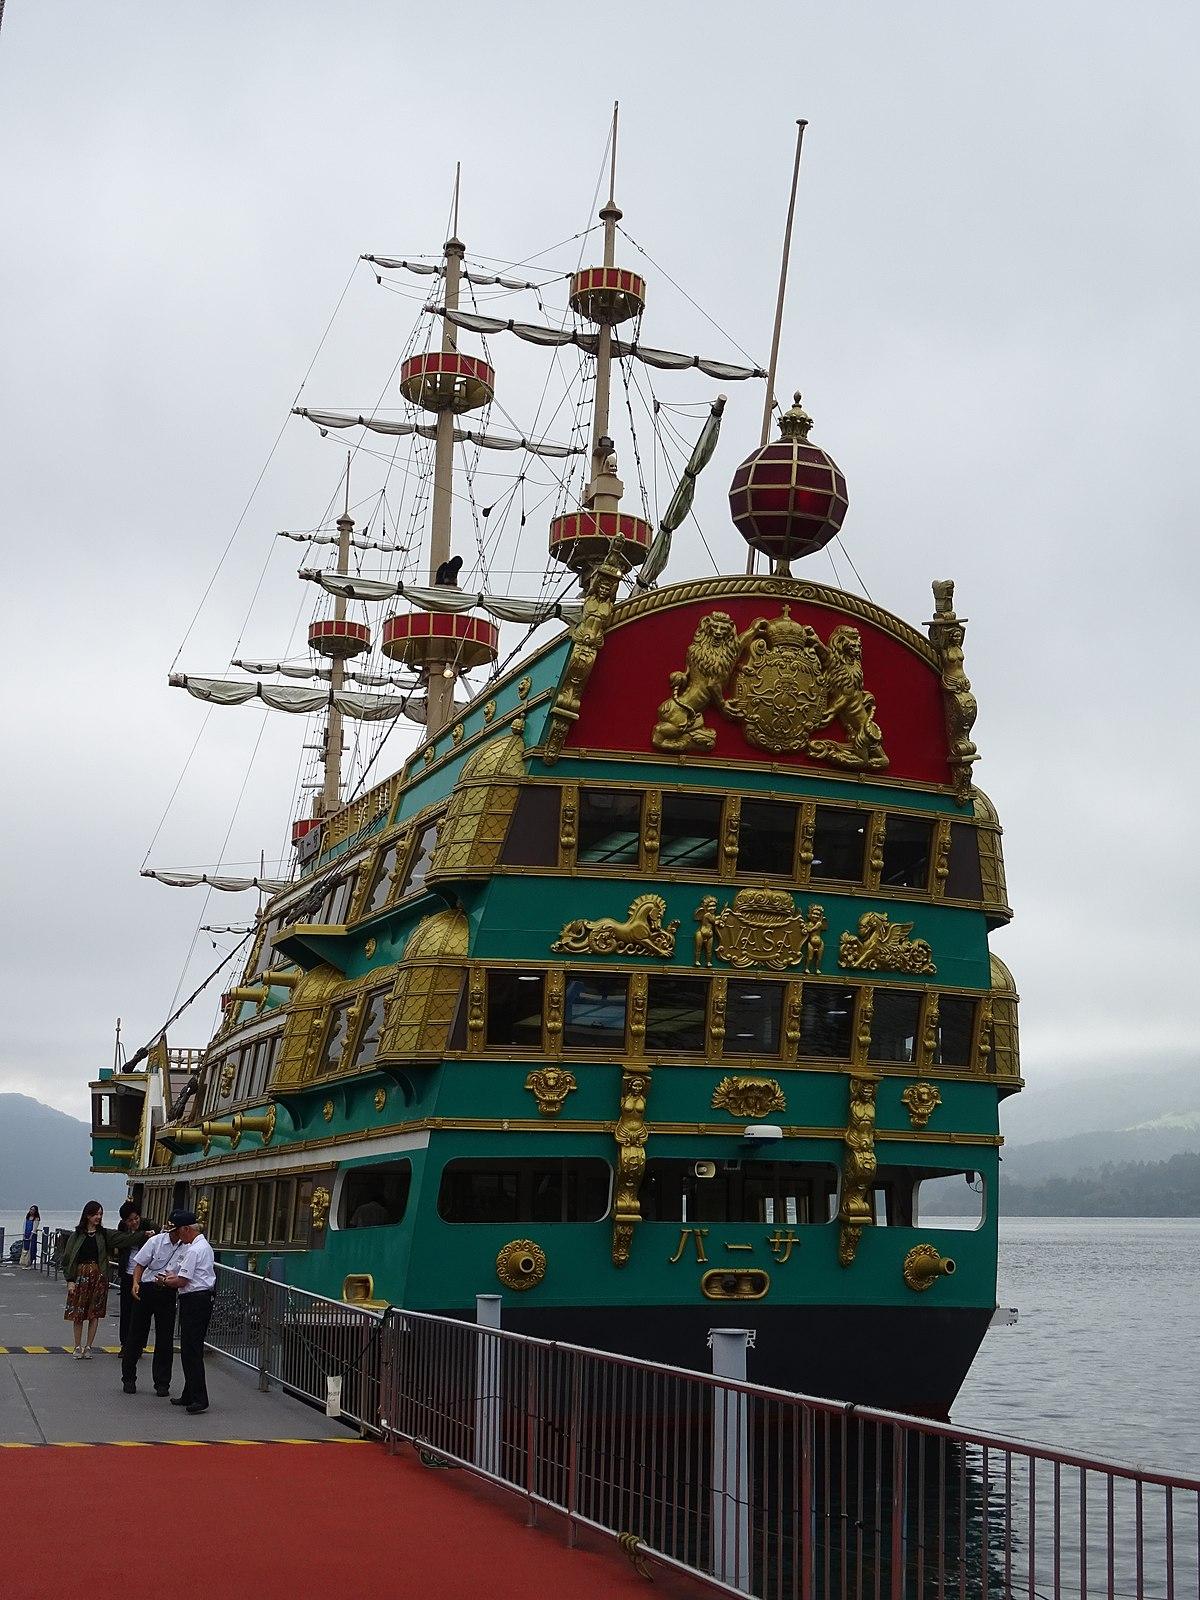 File:Vasa (ship, 1991).jpg - Wikimedia Commons